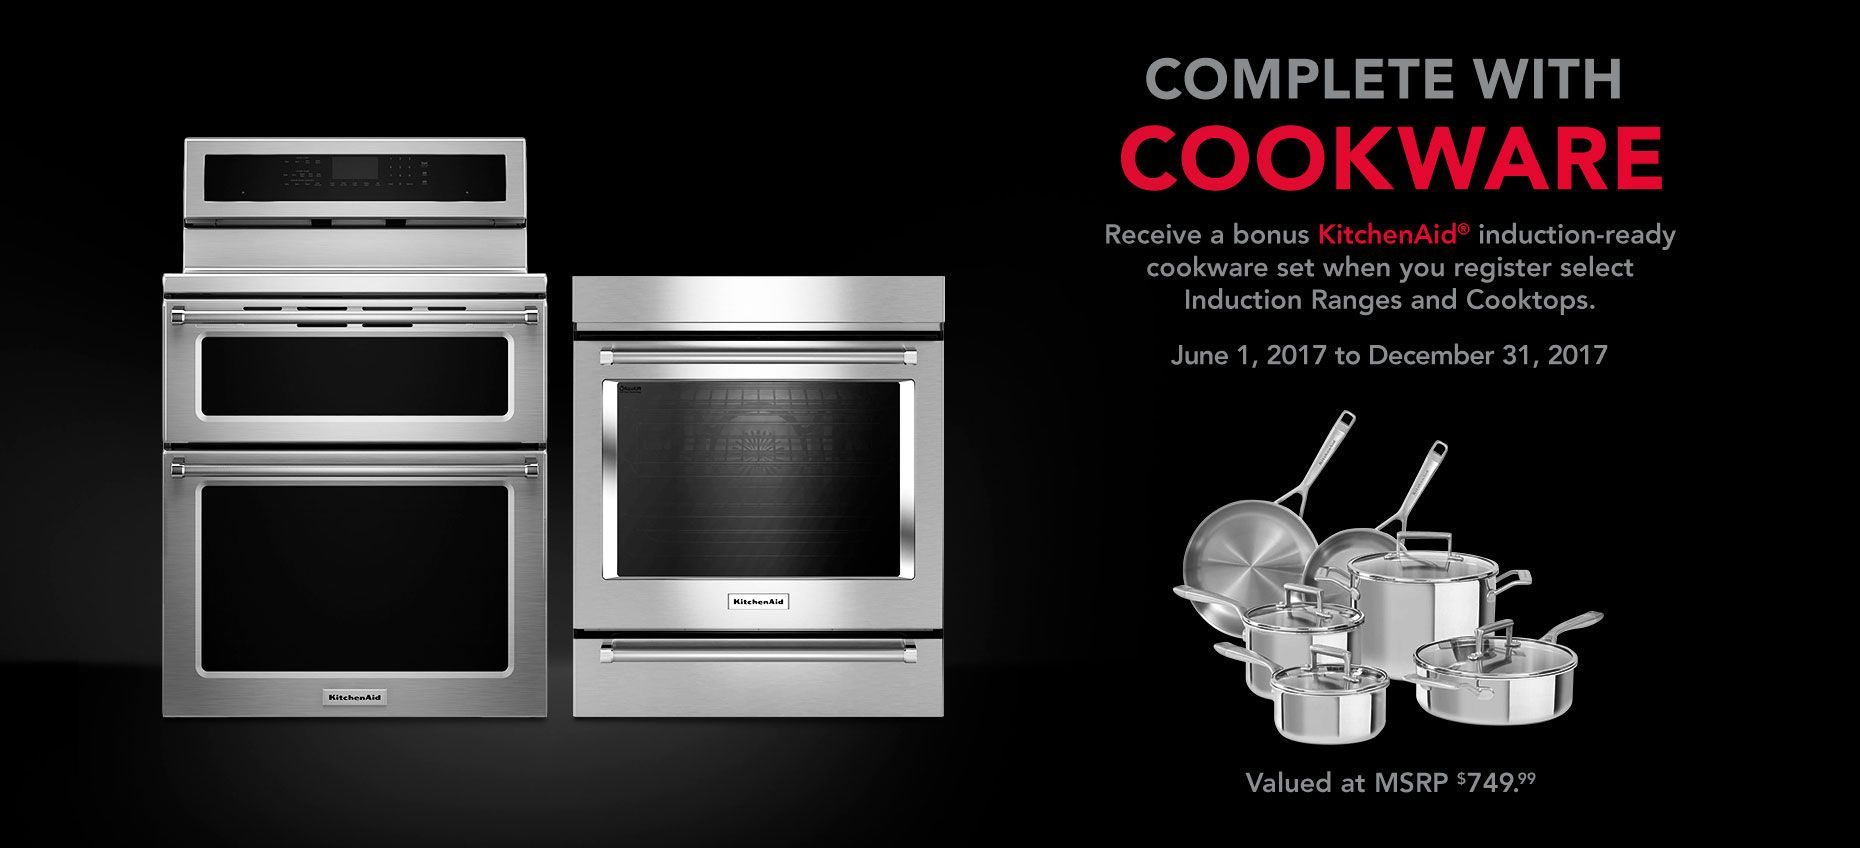 Kitchenaid june promo kitchen aid induction cookware